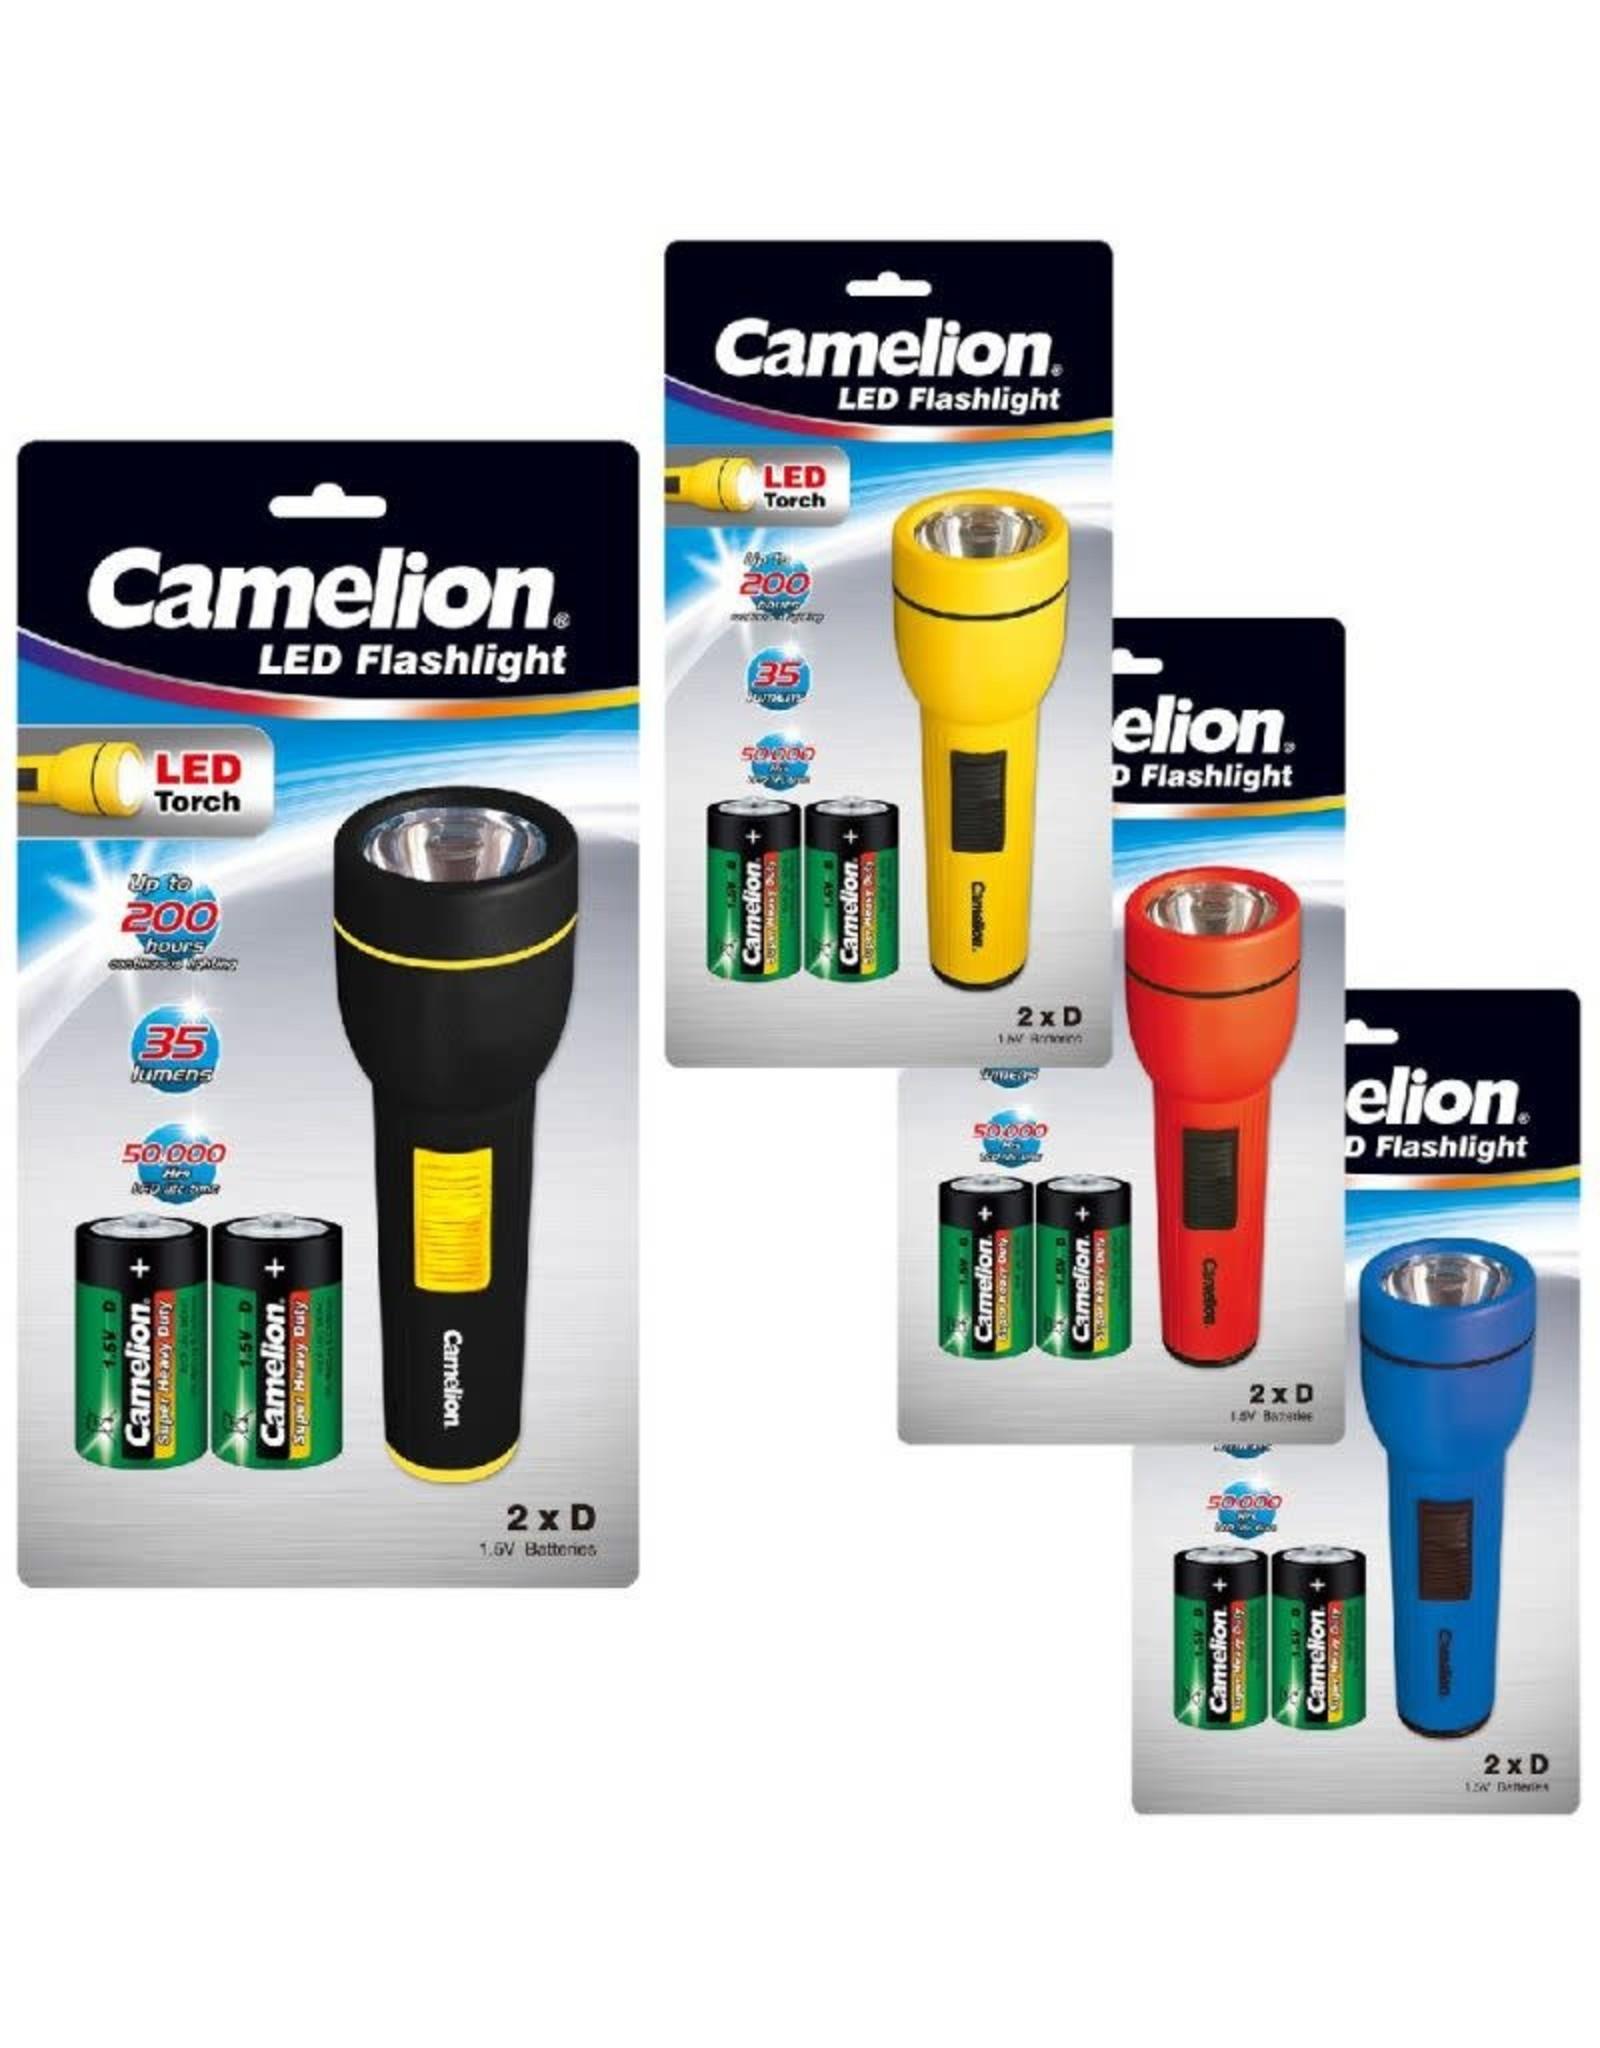 Camelion Zaklamp FL1DB2R20P Torche with 2 x R20 Batteries LED